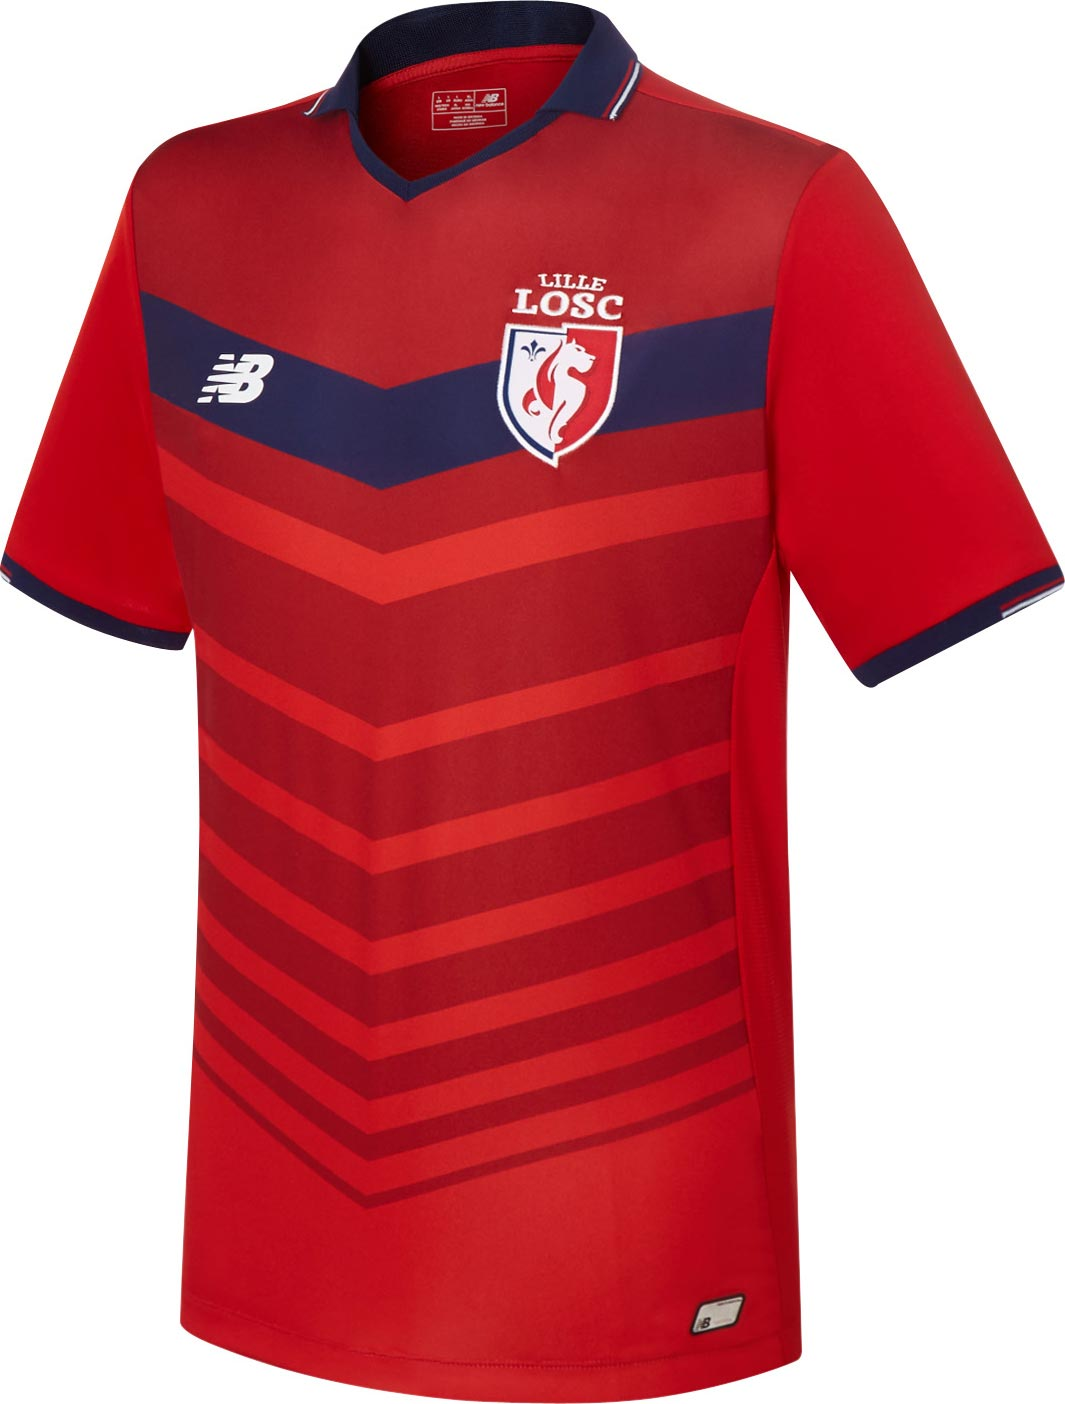 lille-16-17-away-kit-shirt-front